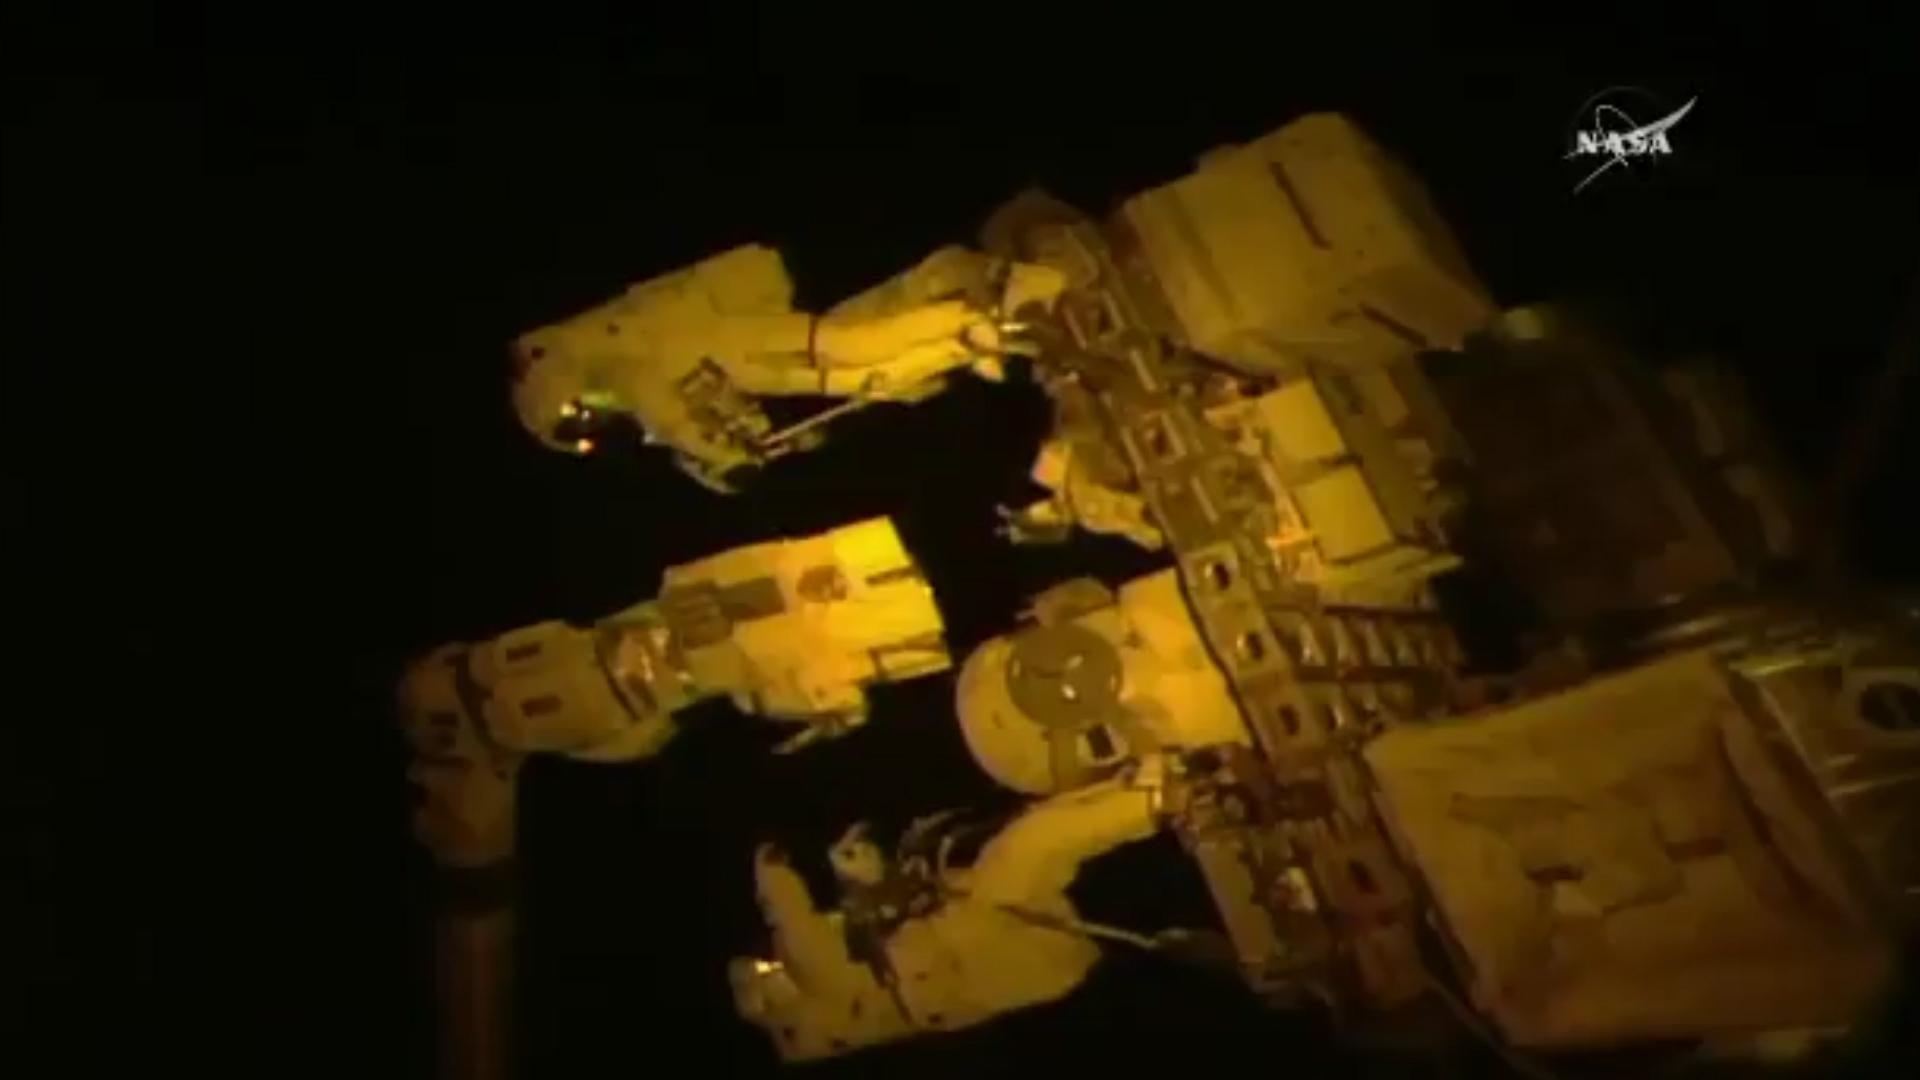 Nasa astronauts work on robotic arm outside International Space Station